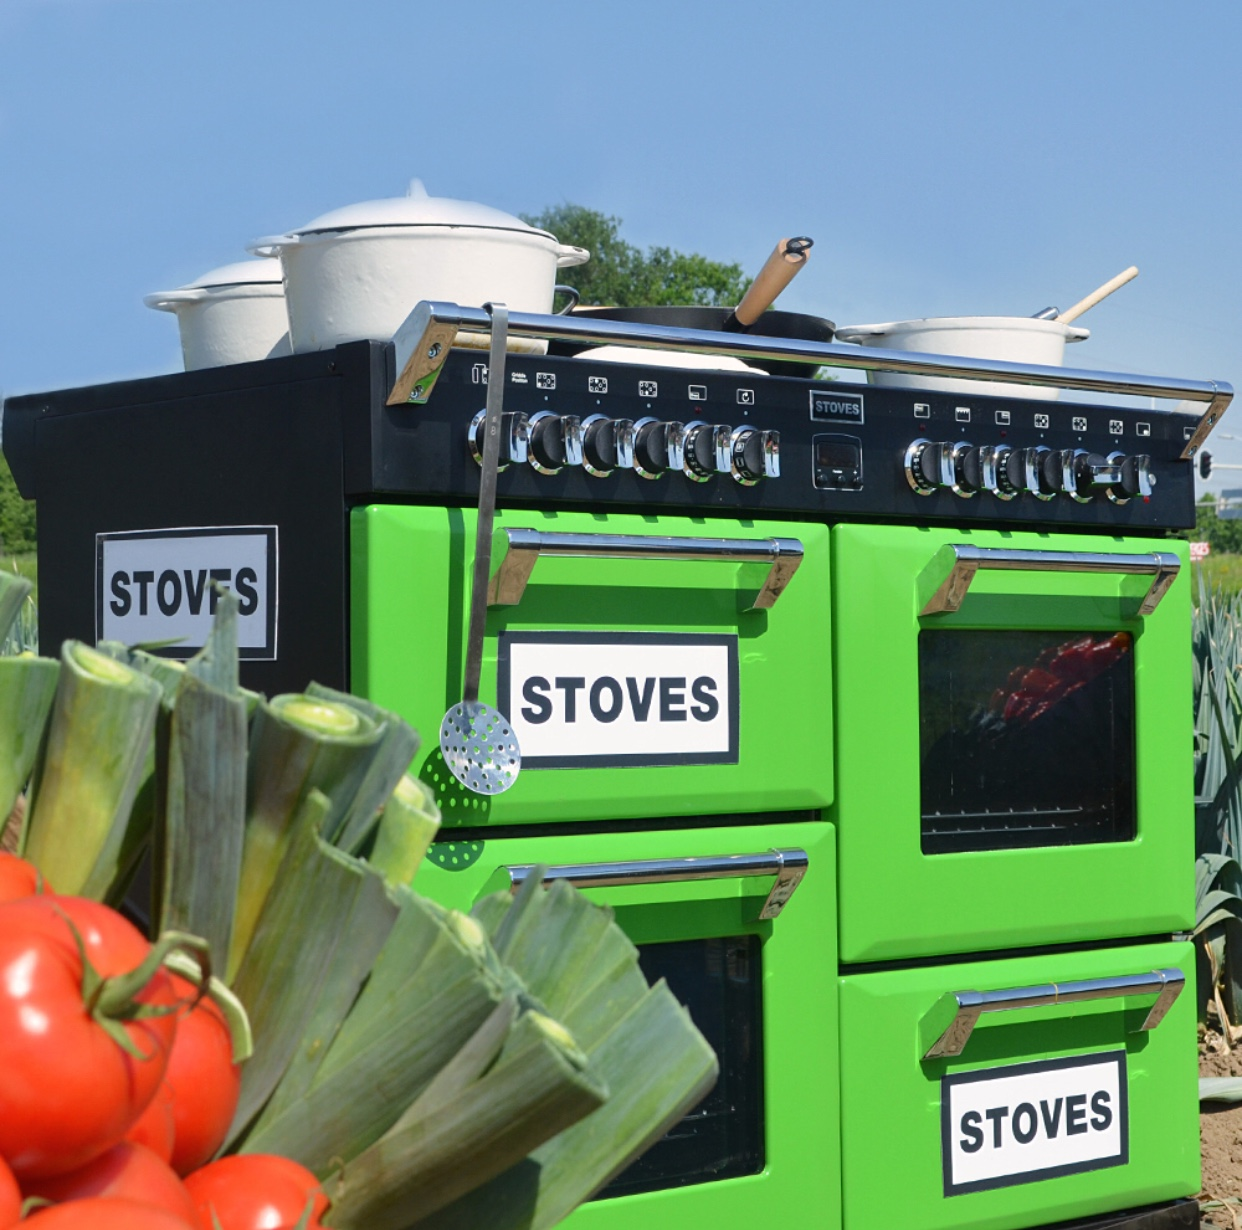 Stoves fornuis Richmond in kleur groen - Uit Nederland proeft op RTL4 #fornuis #keukeninspiratie #gezienoptv #nederlandproeft #rtl4 #stovesfornujizen #kleurindekeuken